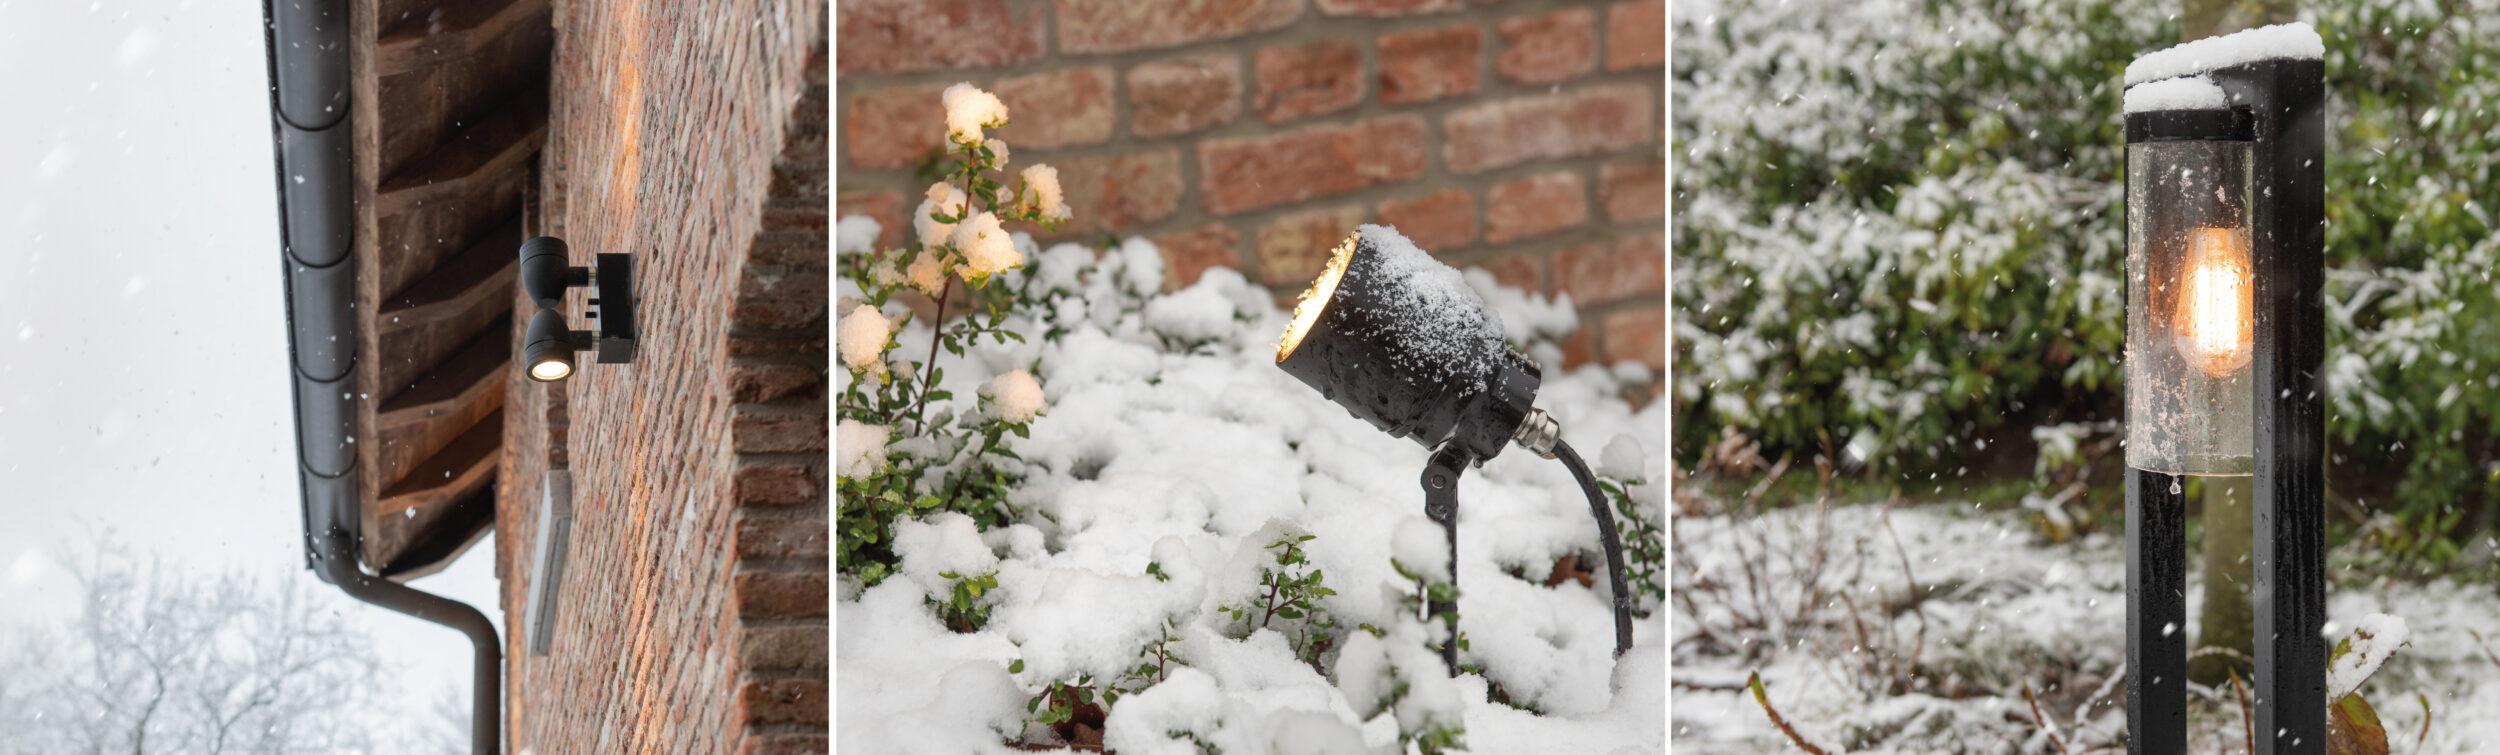 Caroussel winter 02